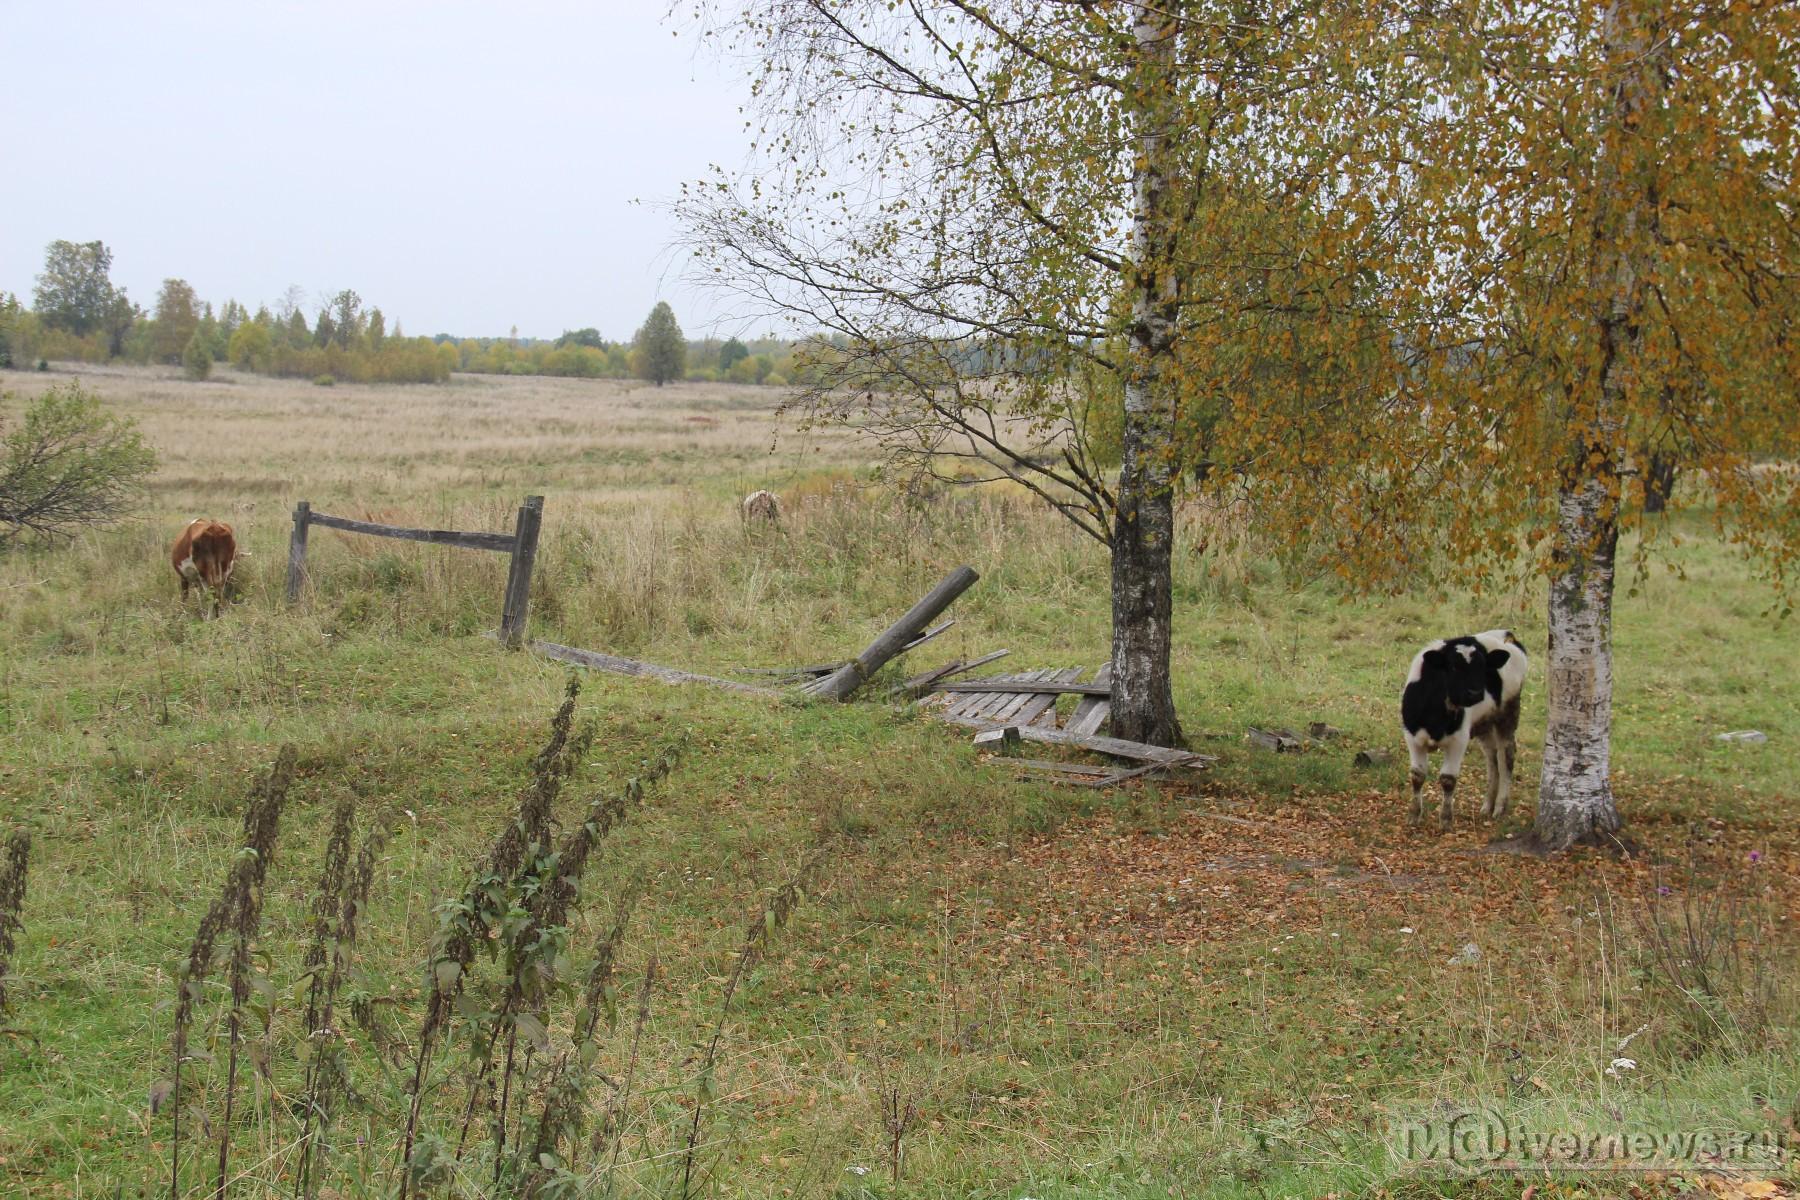 волки в деревне фото сентябре спортсменов центра